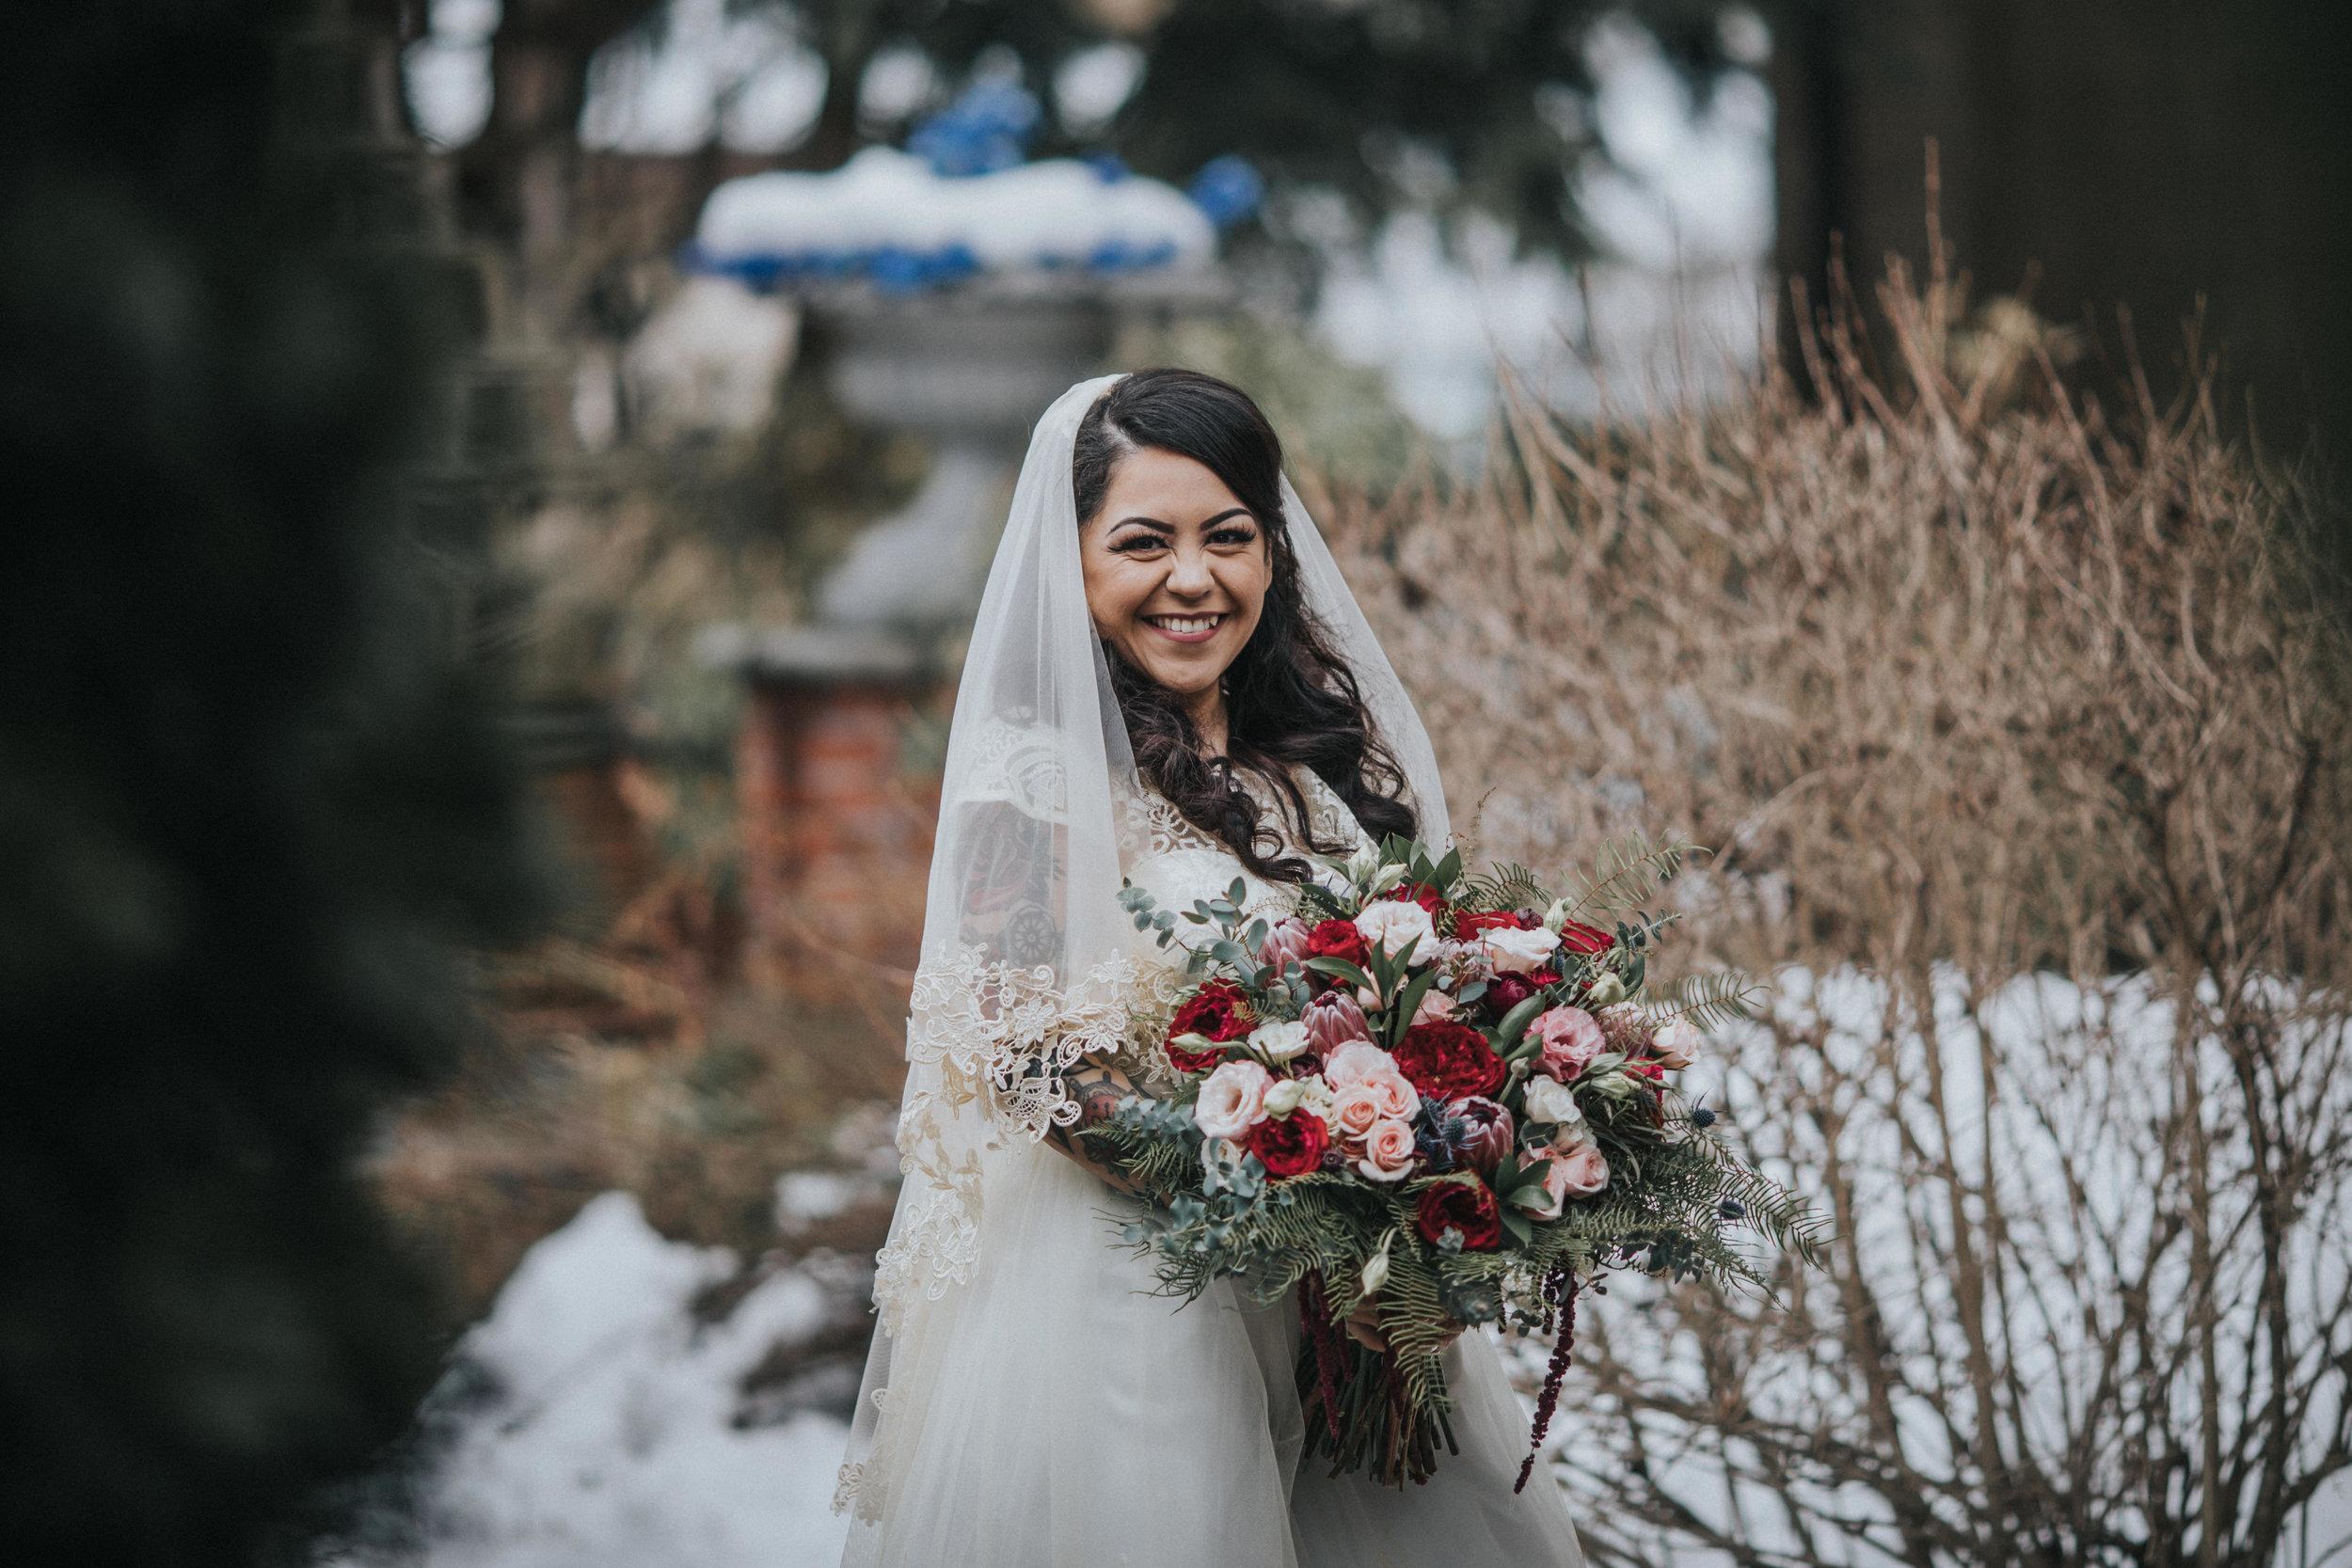 New-Jersey-Wedding-Photographer-ReceptionCenter-Valeria&Mike-First-Look-Bride&Groom (21 of 69).jpg